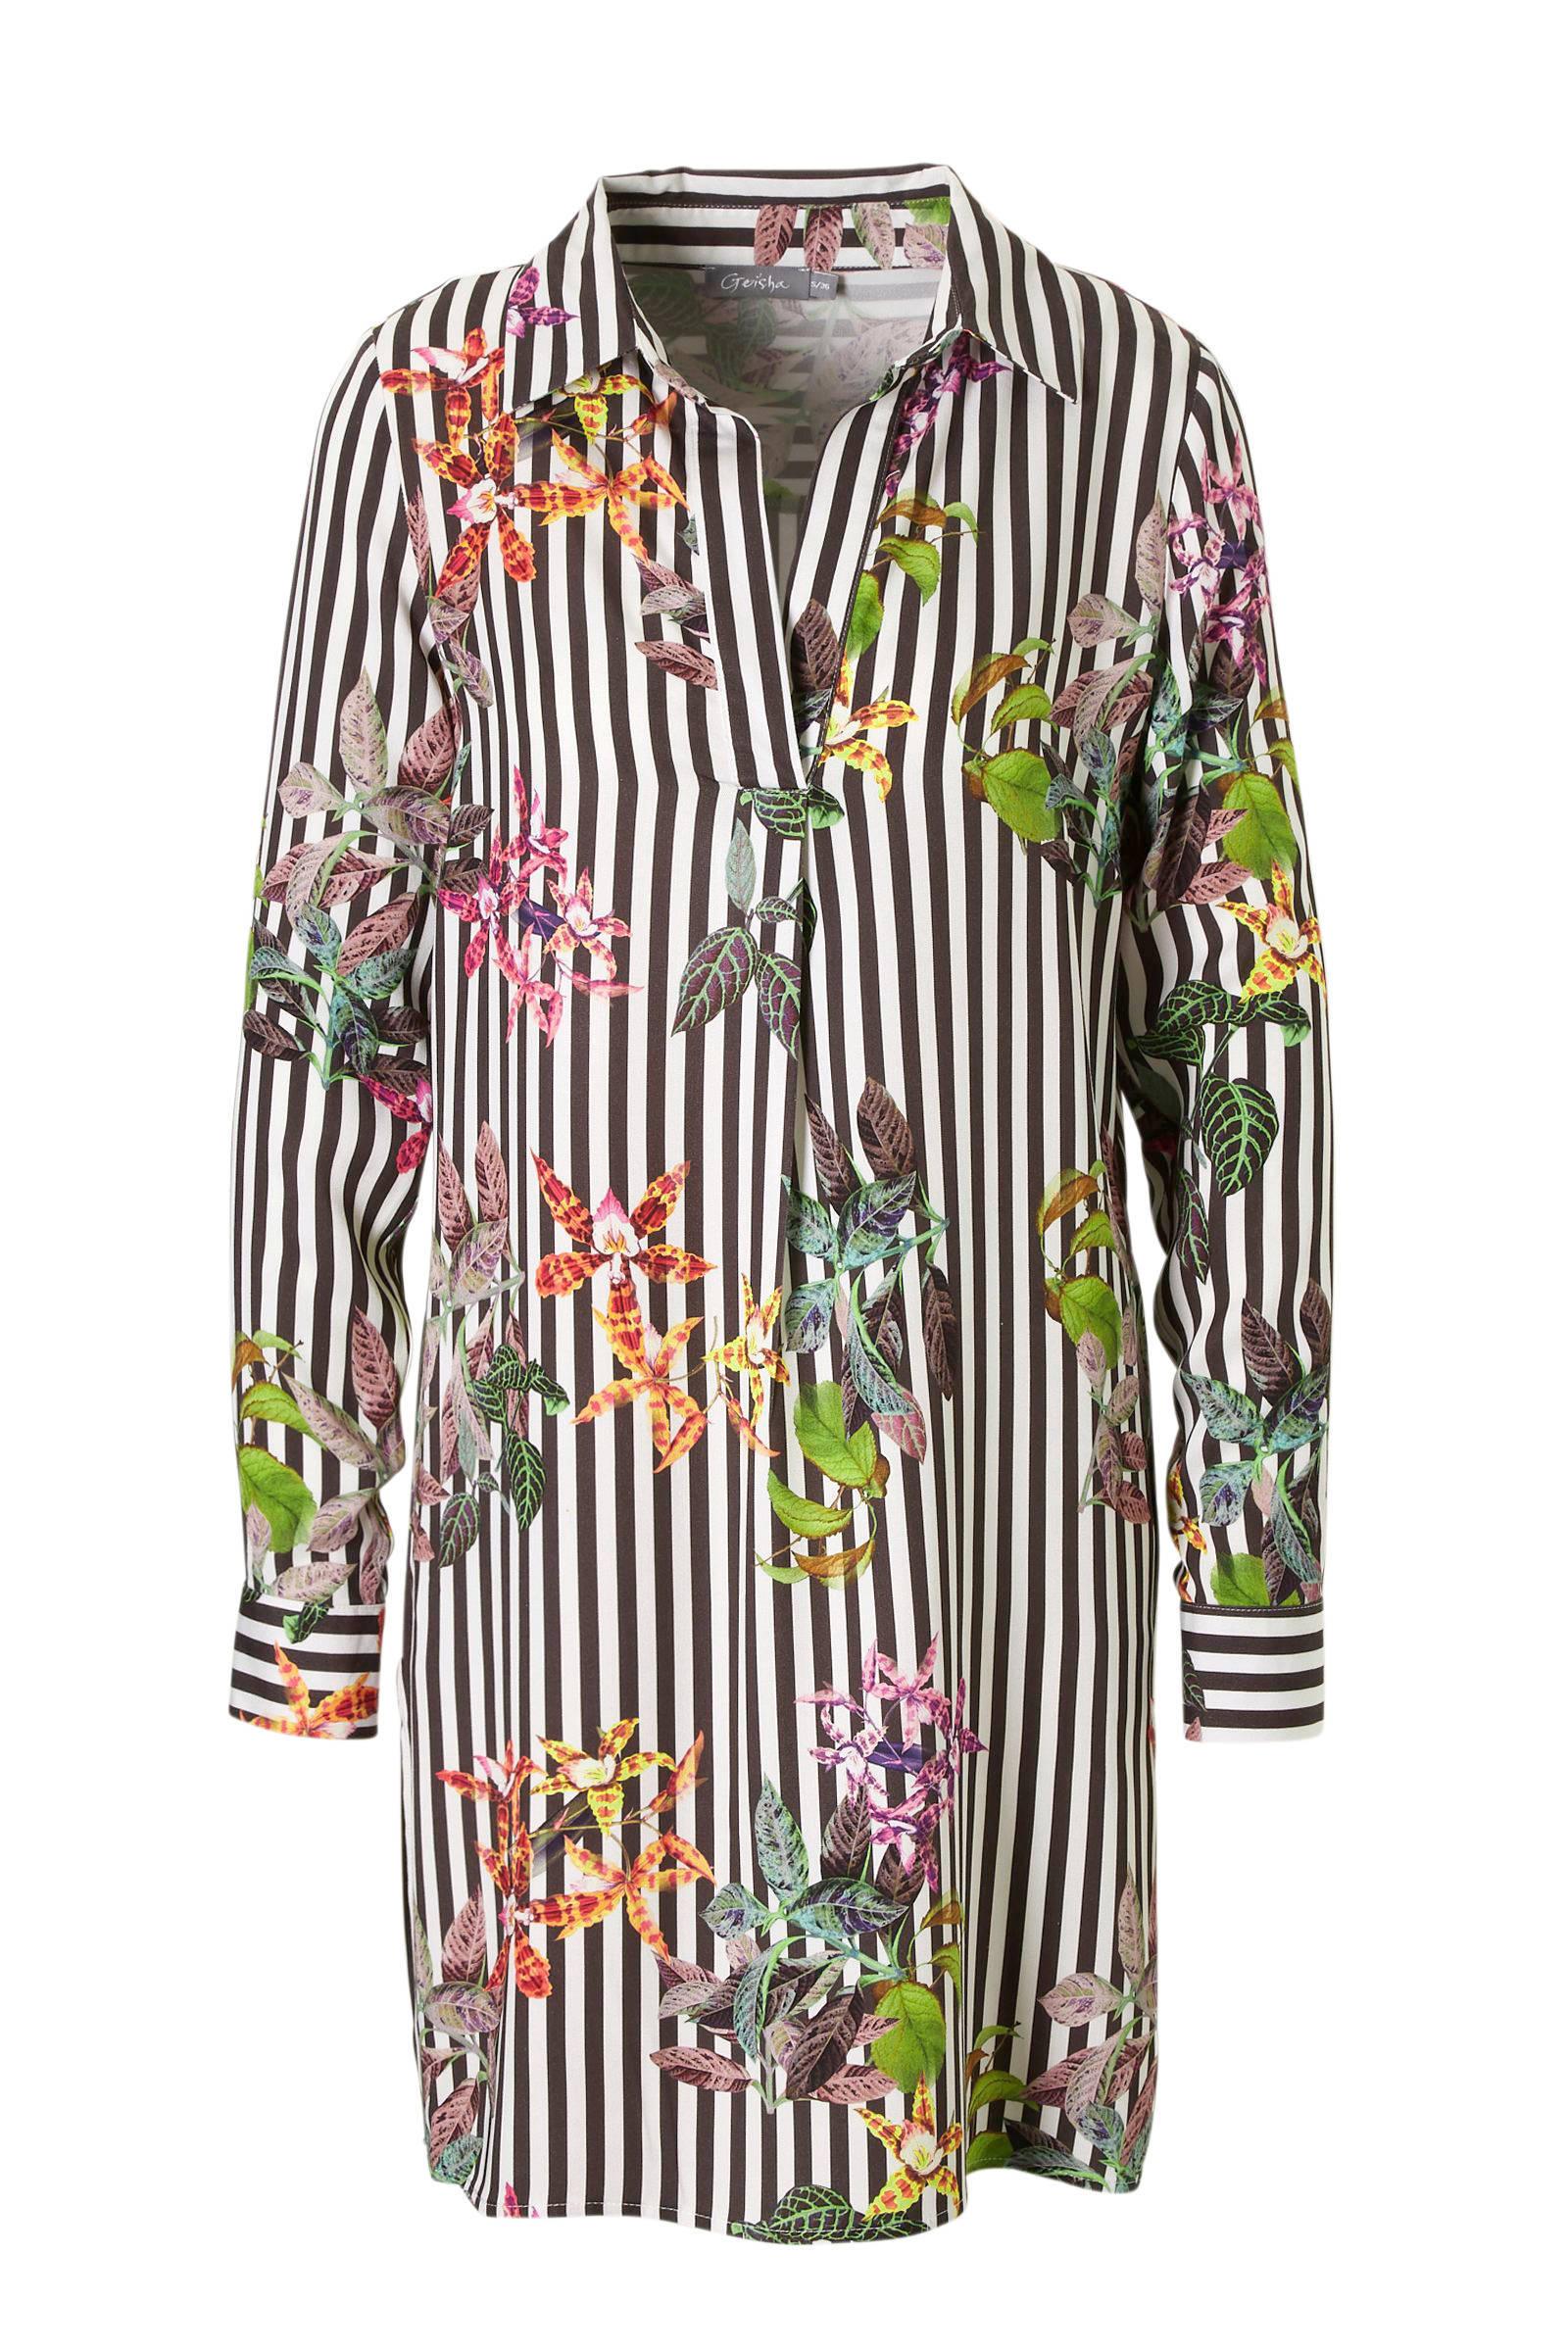 creme kleurige dames blouse